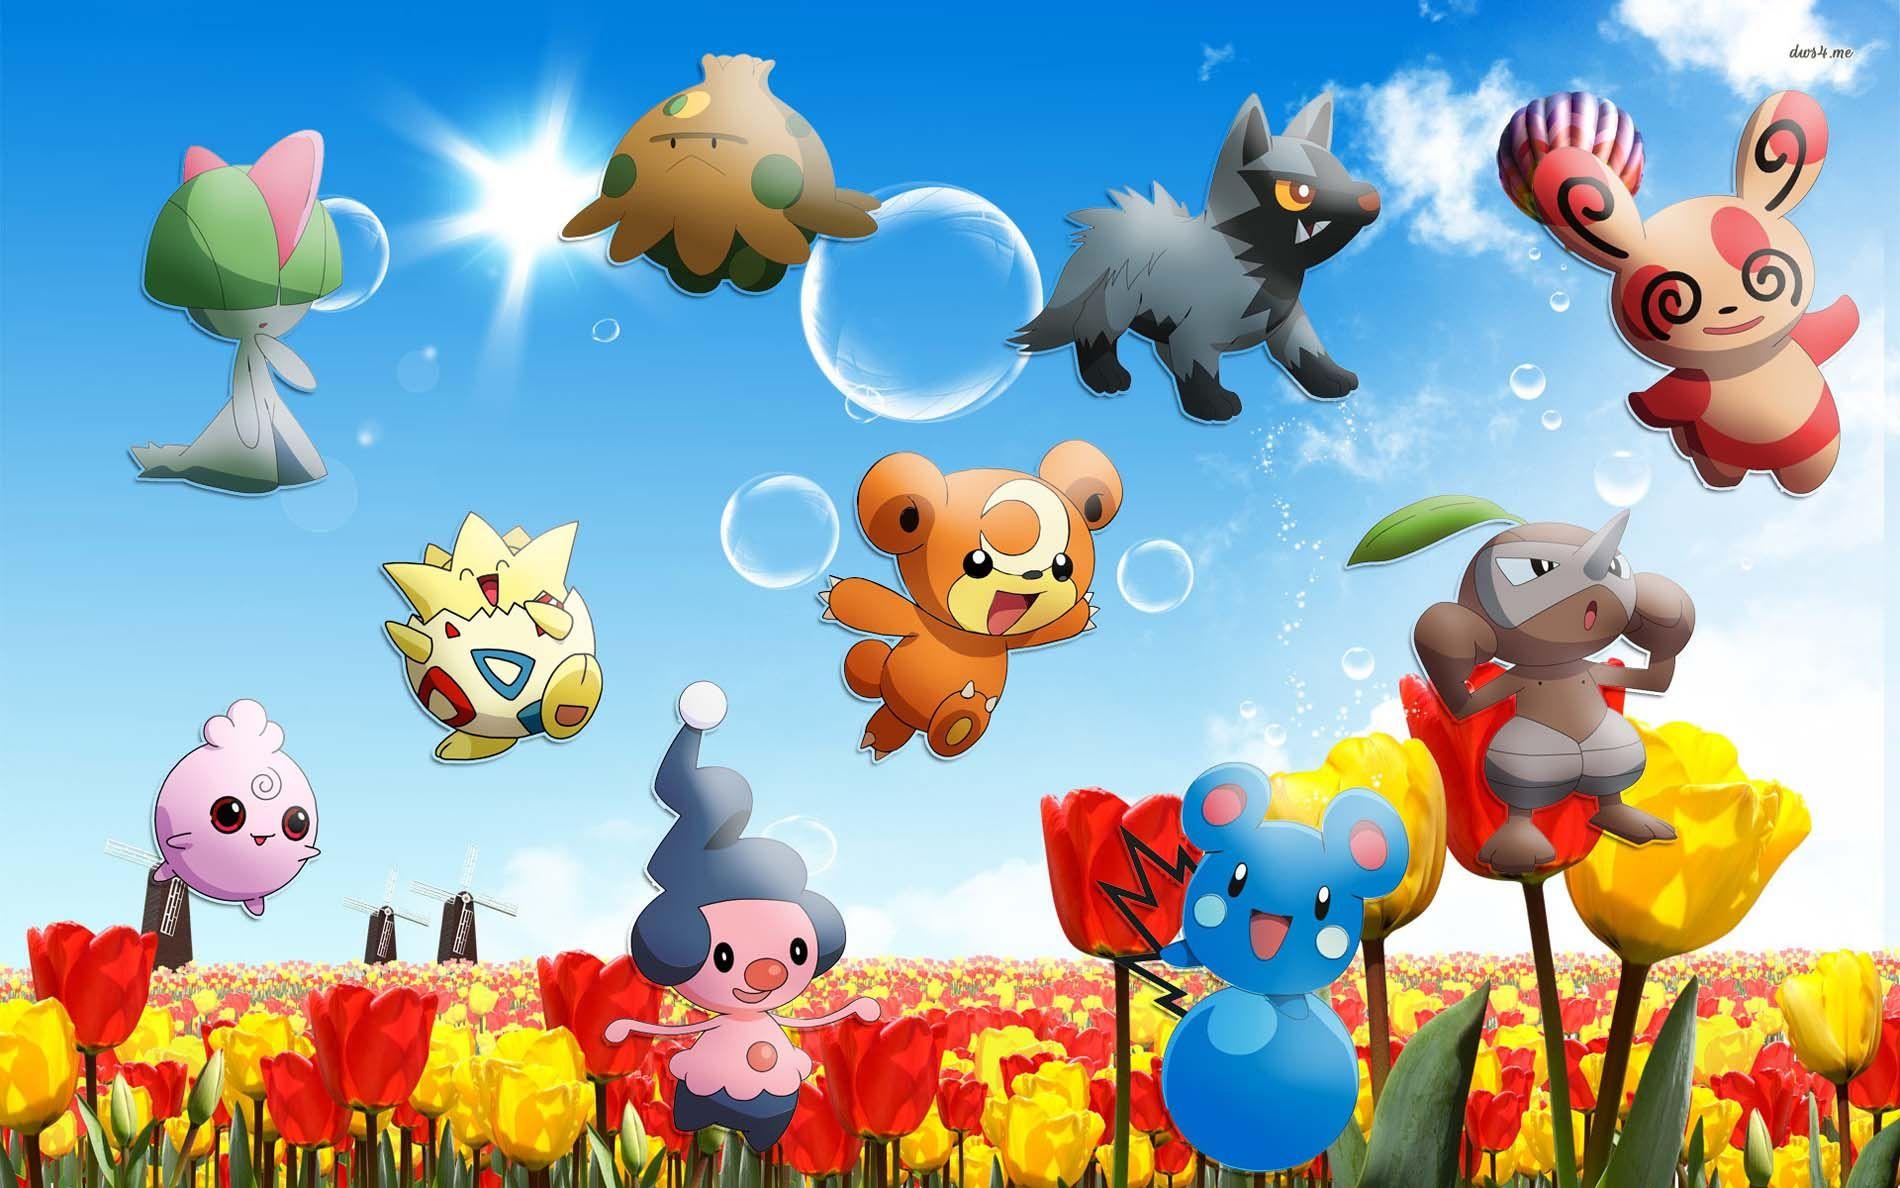 Free Easter Wallpaper Backgrounds Wallaadoo Pikachu Wallpaper Pokemon Eevee Wallpaper